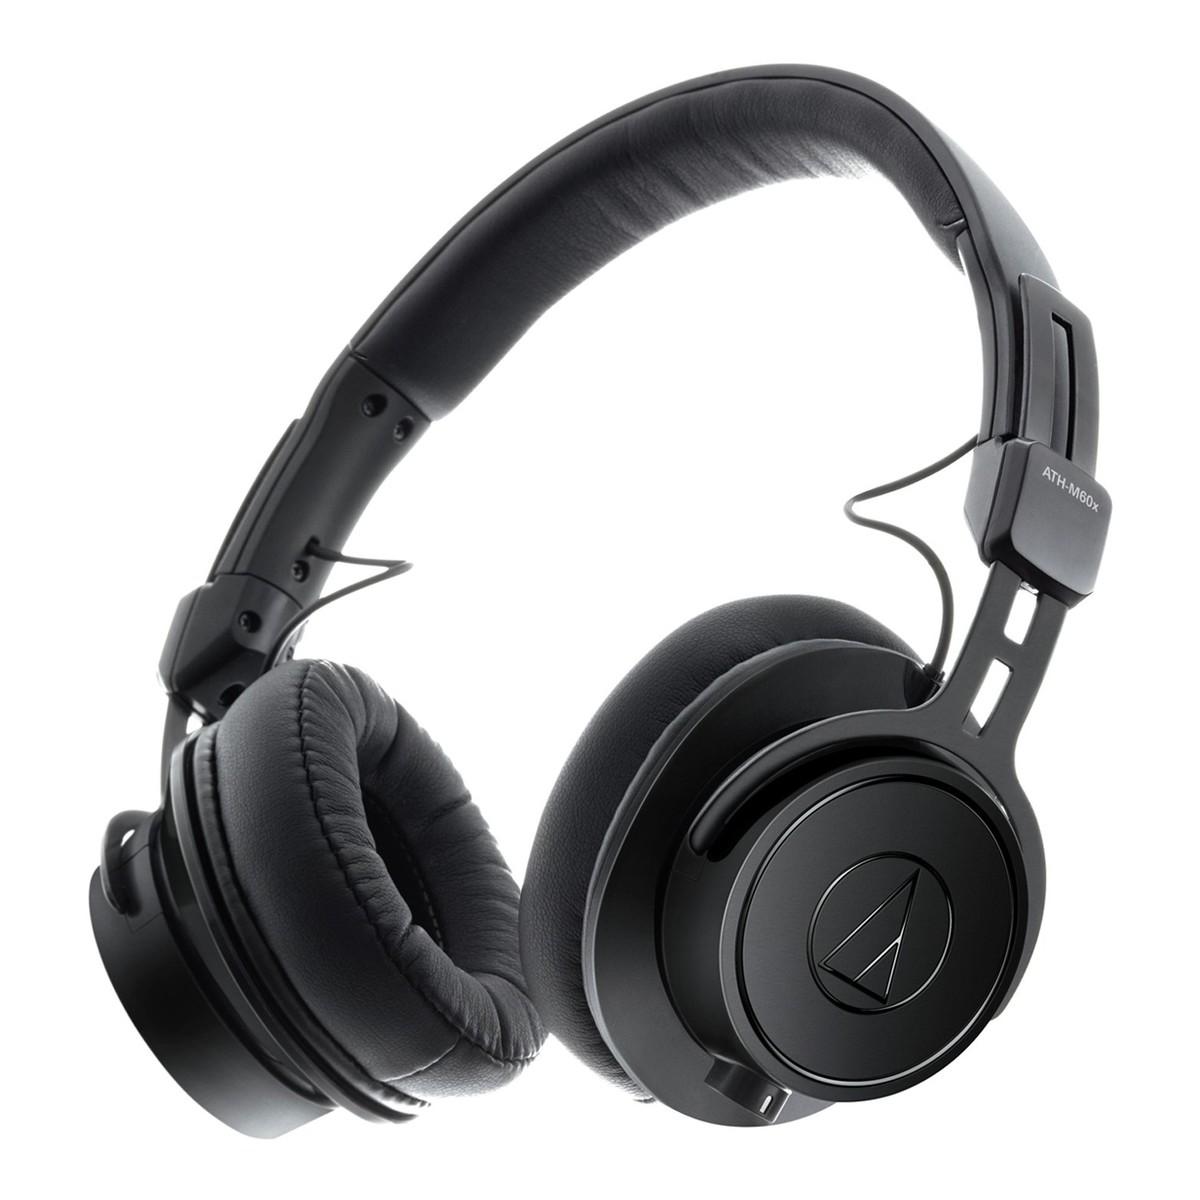 Shop now | Audio Technica ATH-M60x Professional Monitor Headphones, Black